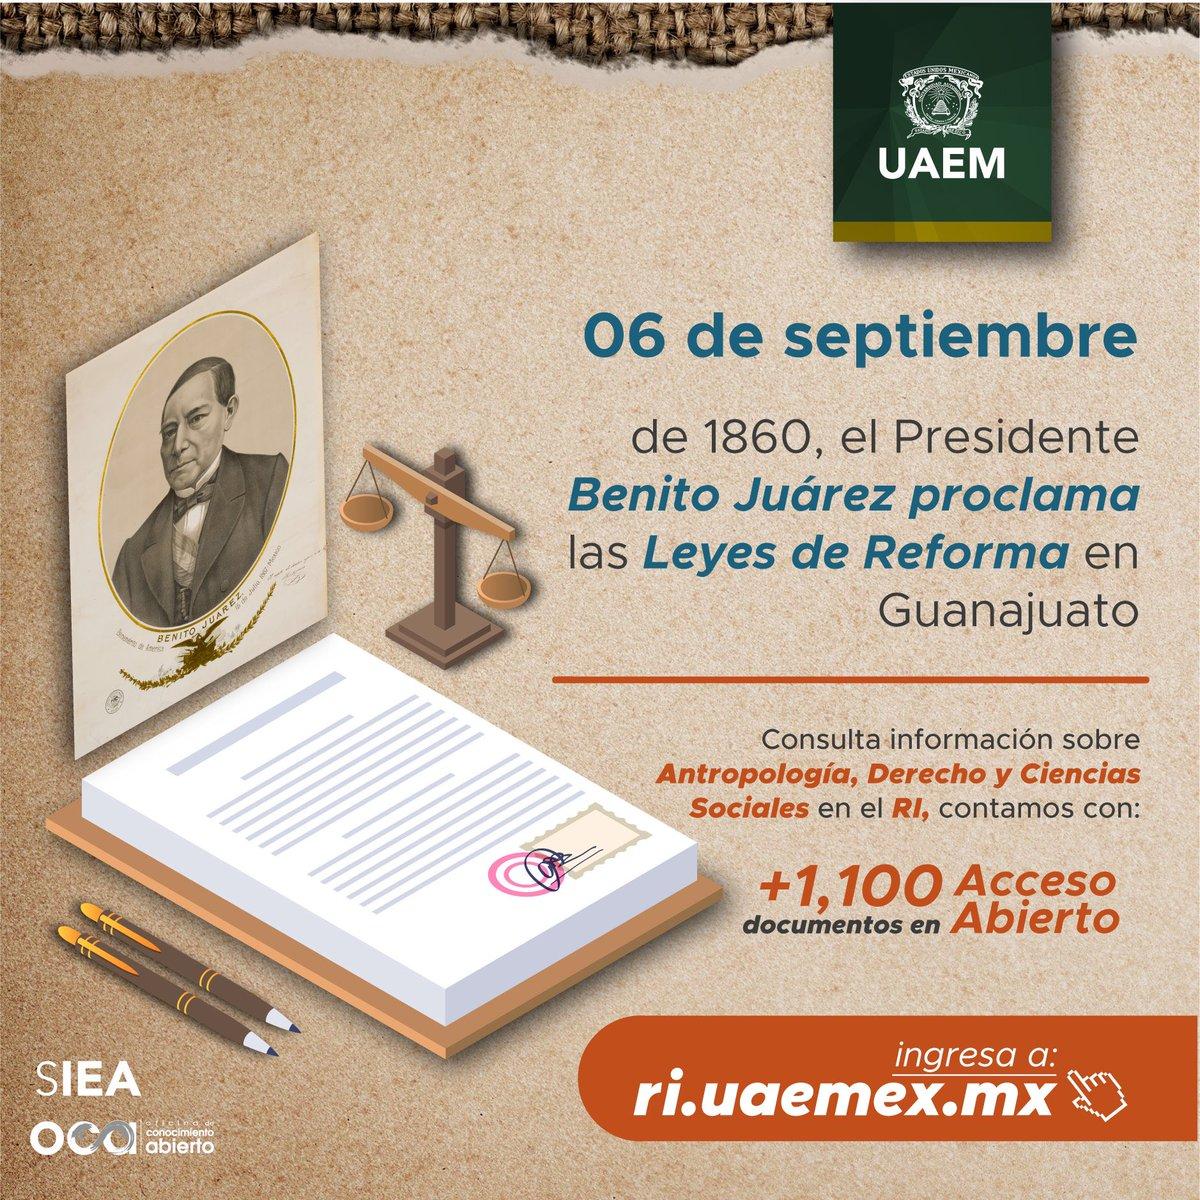 #MiUniversidadEs #AccesoAbierto invitamos a consultar producción científica sobre #Lenguas #Antropologia #CienciasPoliticasySociales en el @RIUAEM_MX, contamos con +1,100 documentos disponibles para ti entra a: https://bit.ly/2UgHyVO, https://bit.ly/2XEXGUUpic.twitter.com/IDv8g5vvu5